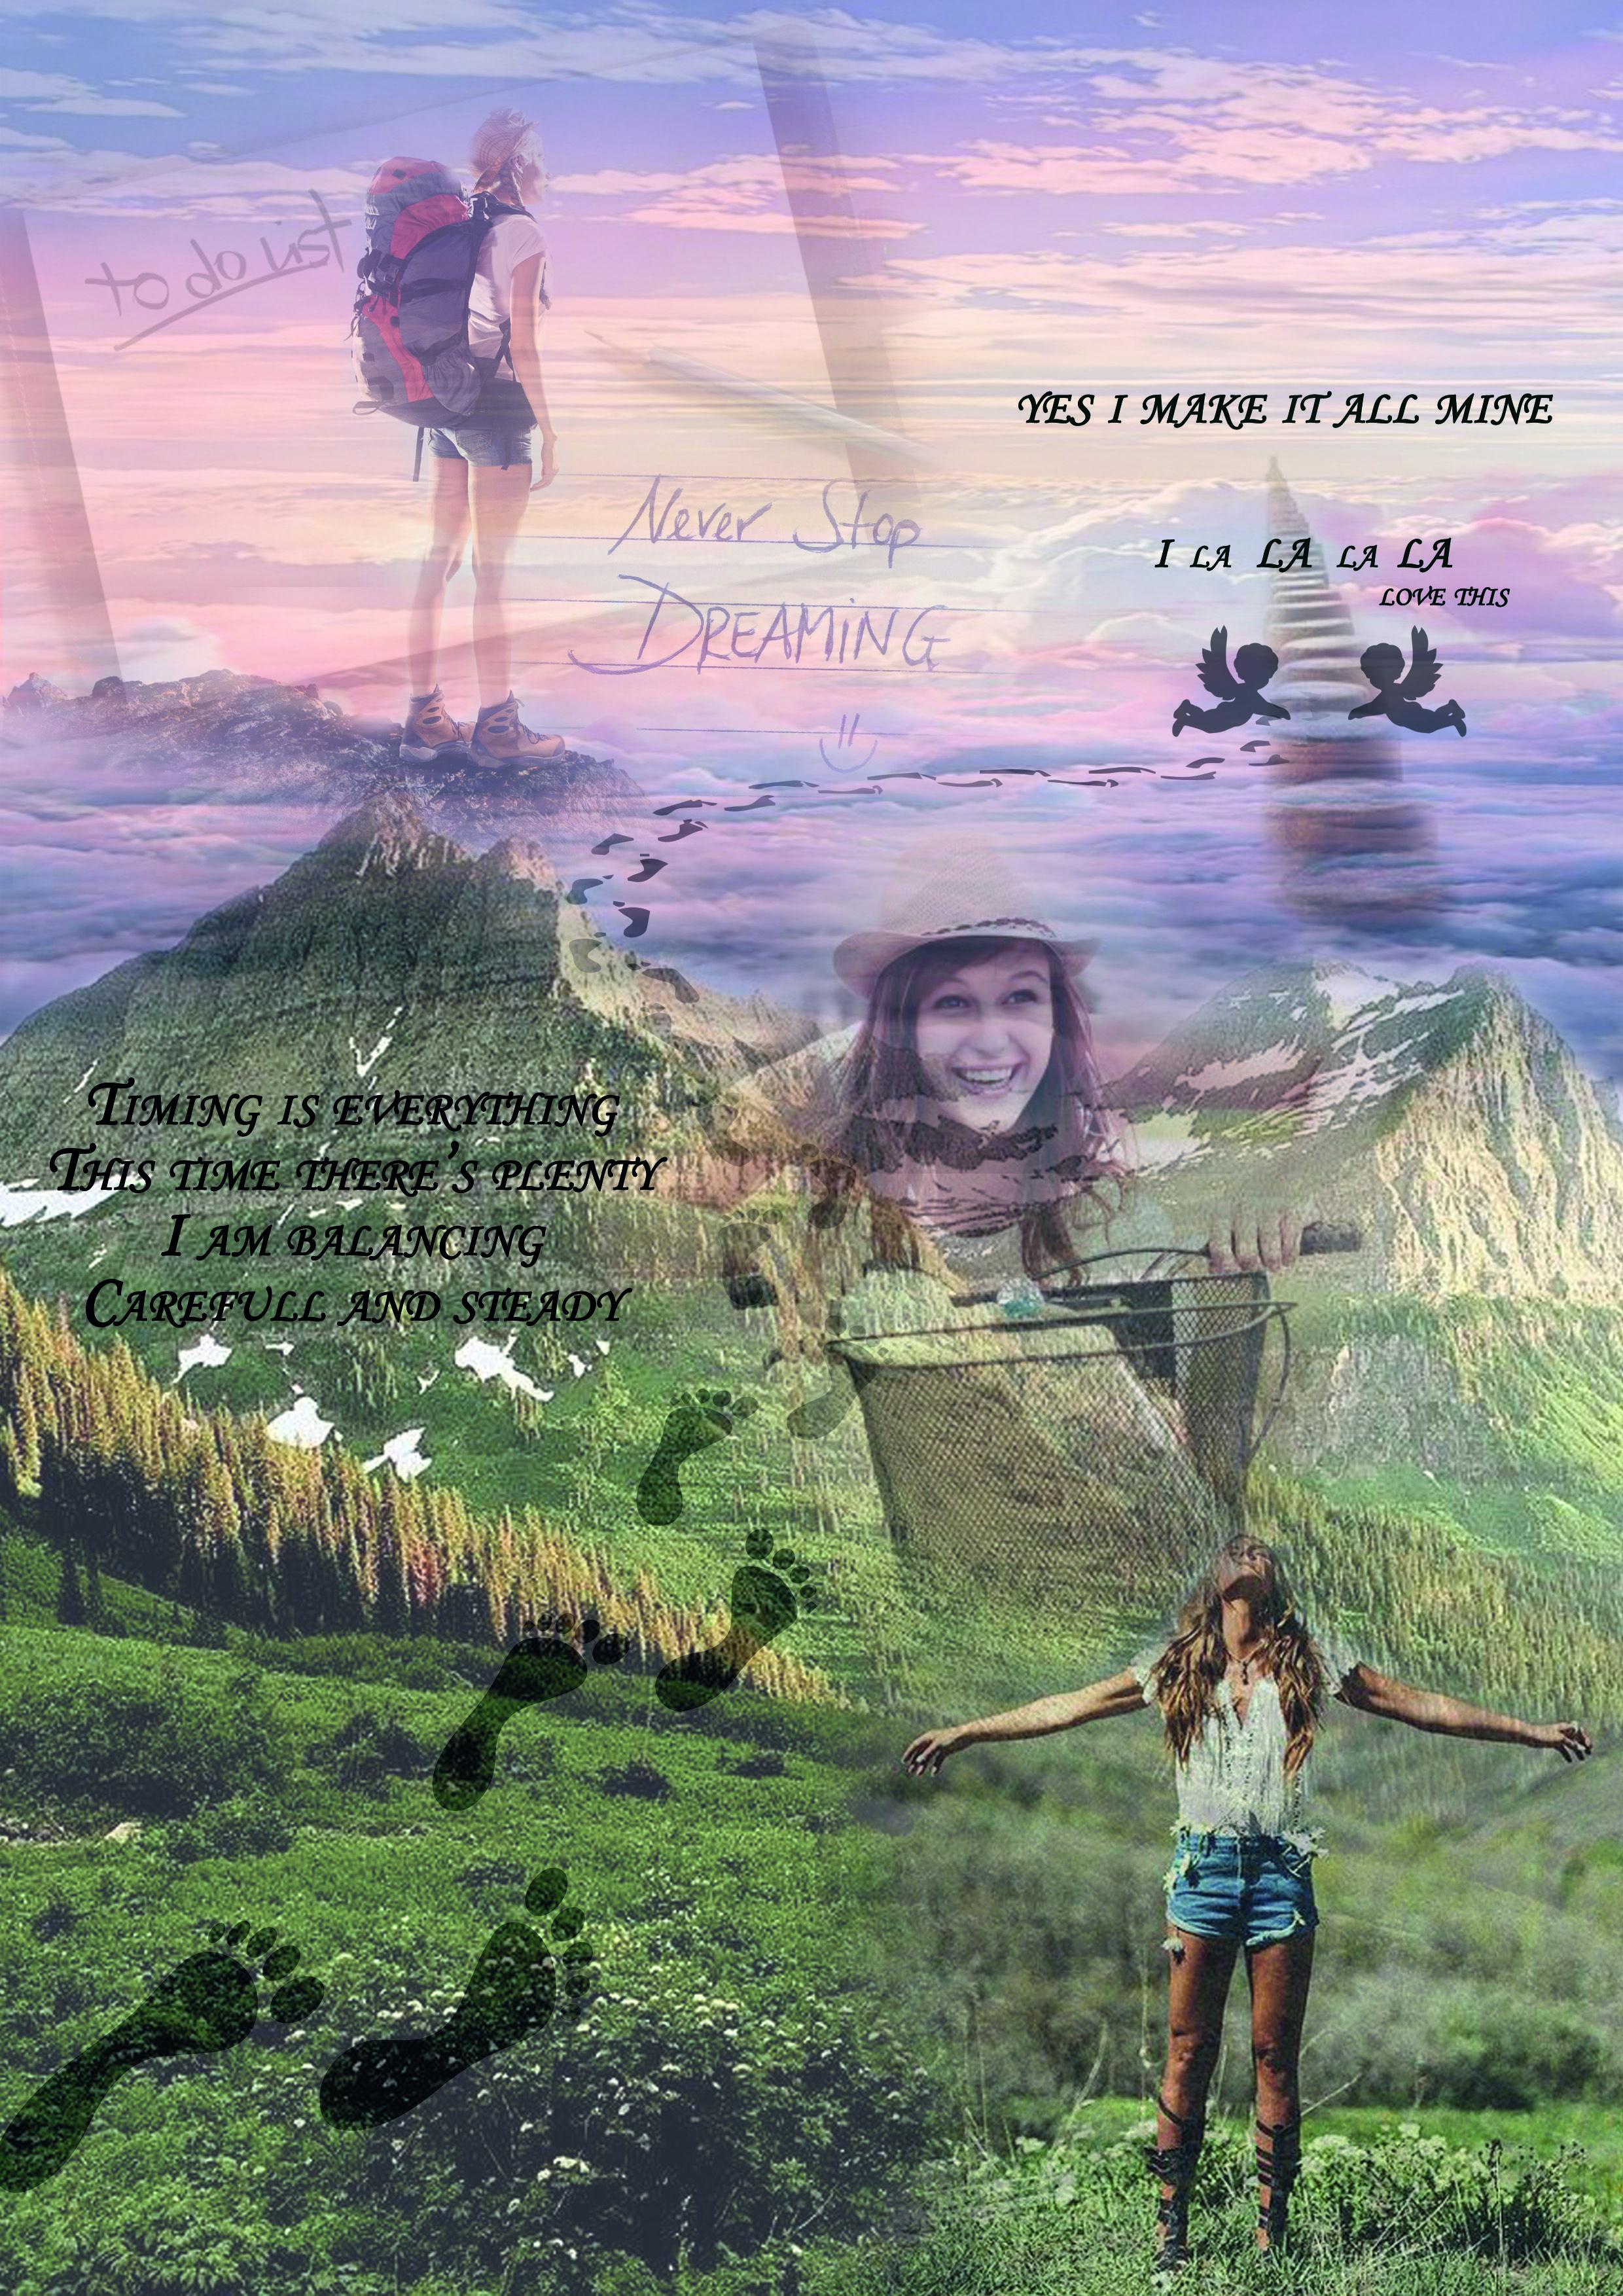 Visualisatie songtekst Jason Mraz - Make it mine (met tekst) | Adeline Willems | Kernwaarde ambitieus